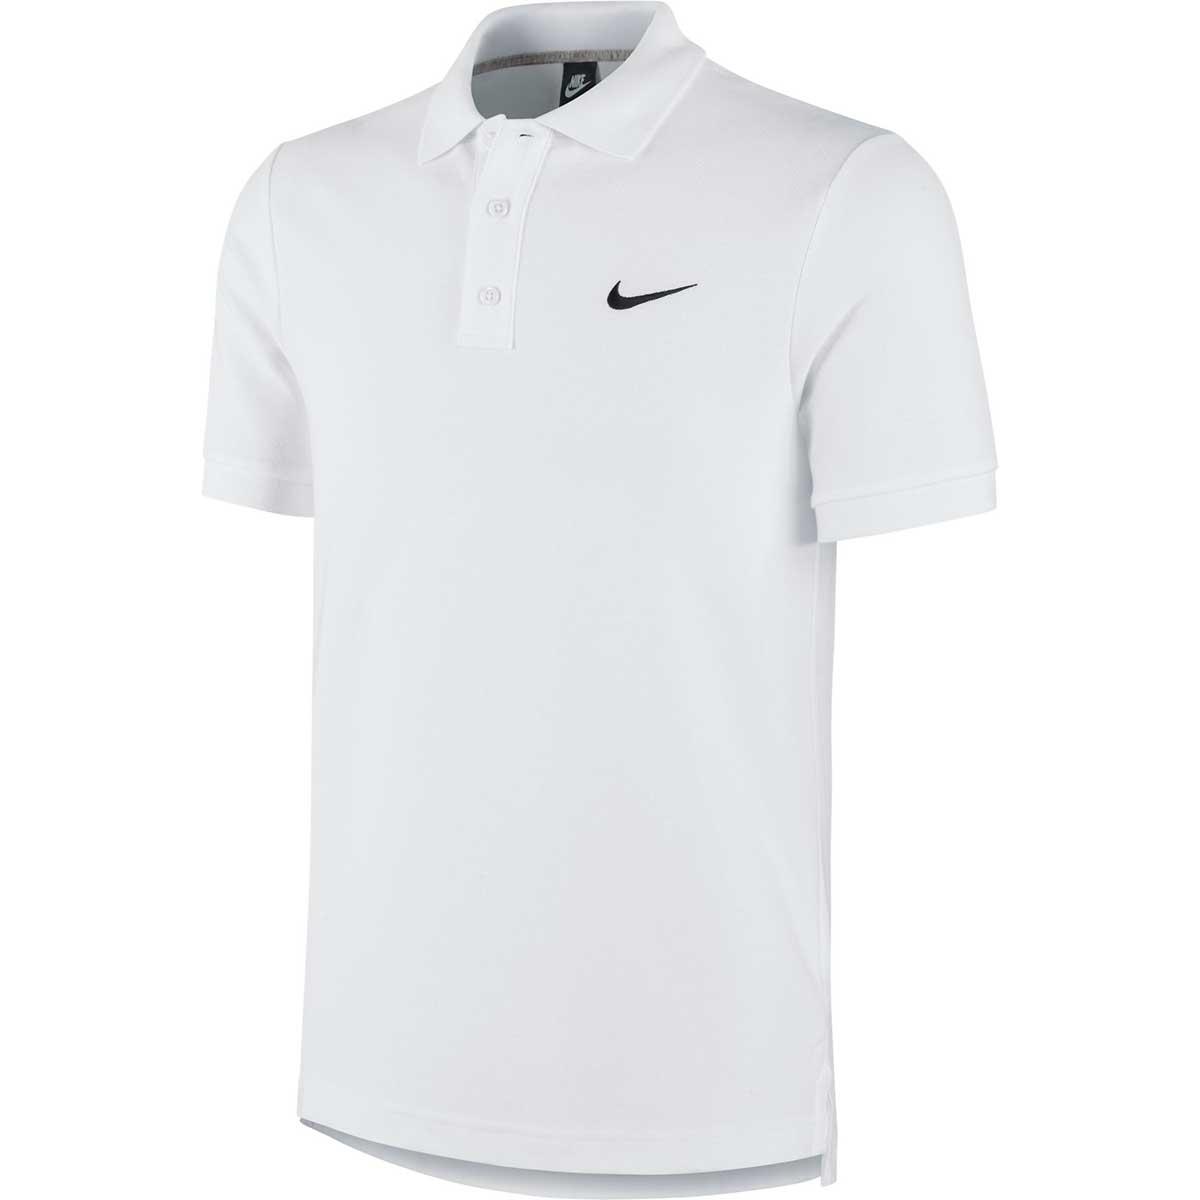 Buy Nike Men s Cotton Polo (White) Online in India f6b4b3c72f61